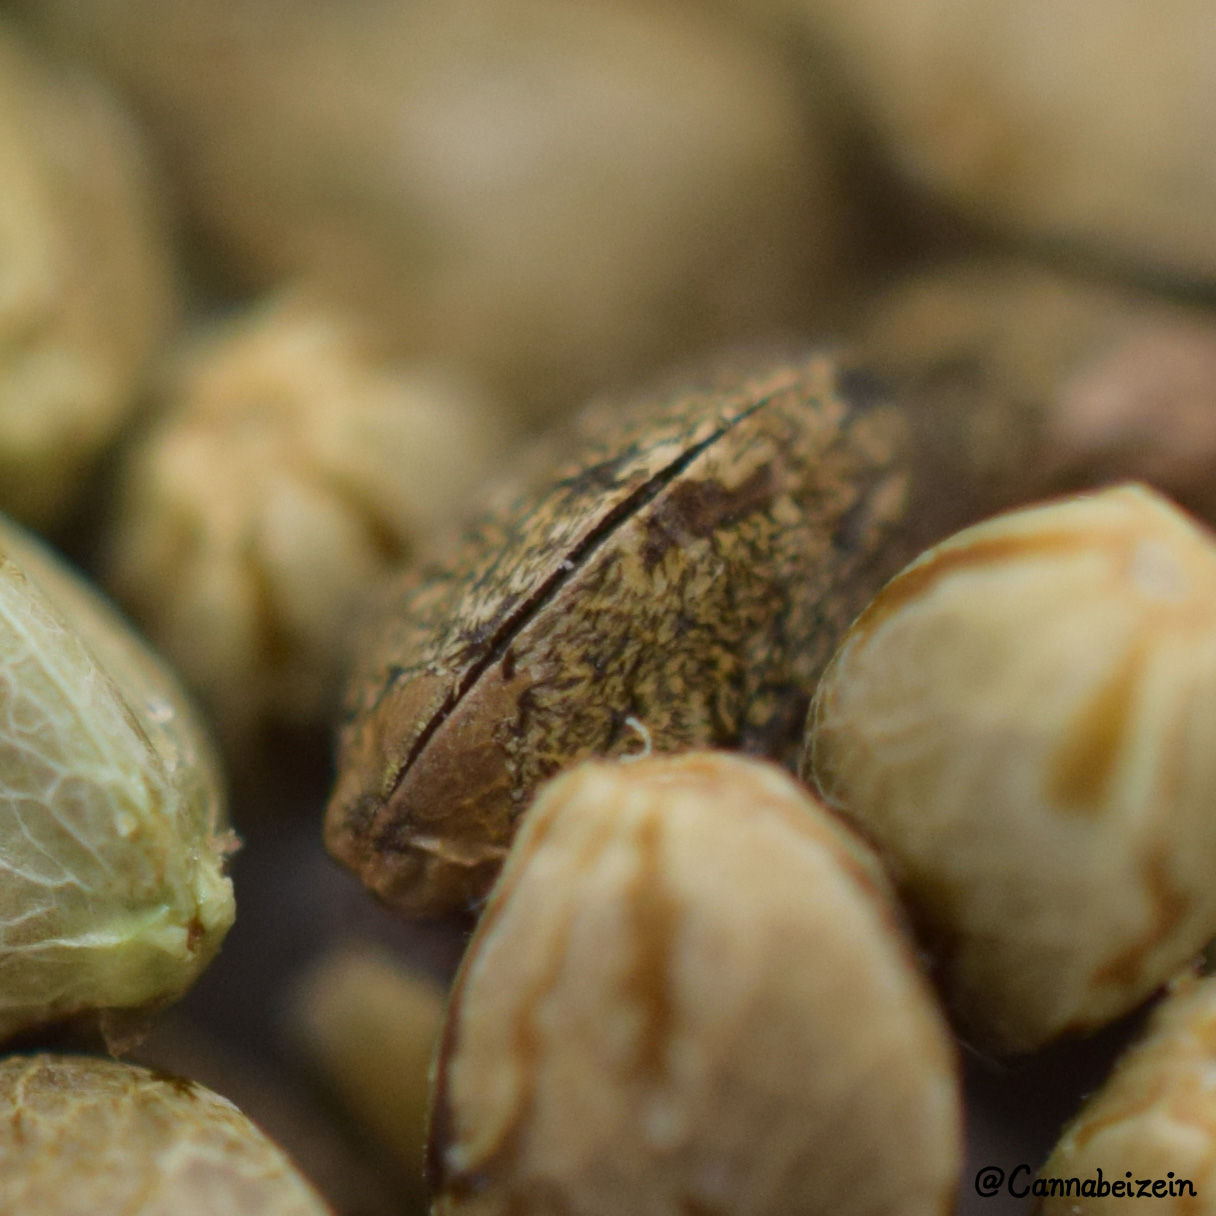 Cannabeizein 0239 - Mystery Mix Seeds - DSC_0818 copy.jpg